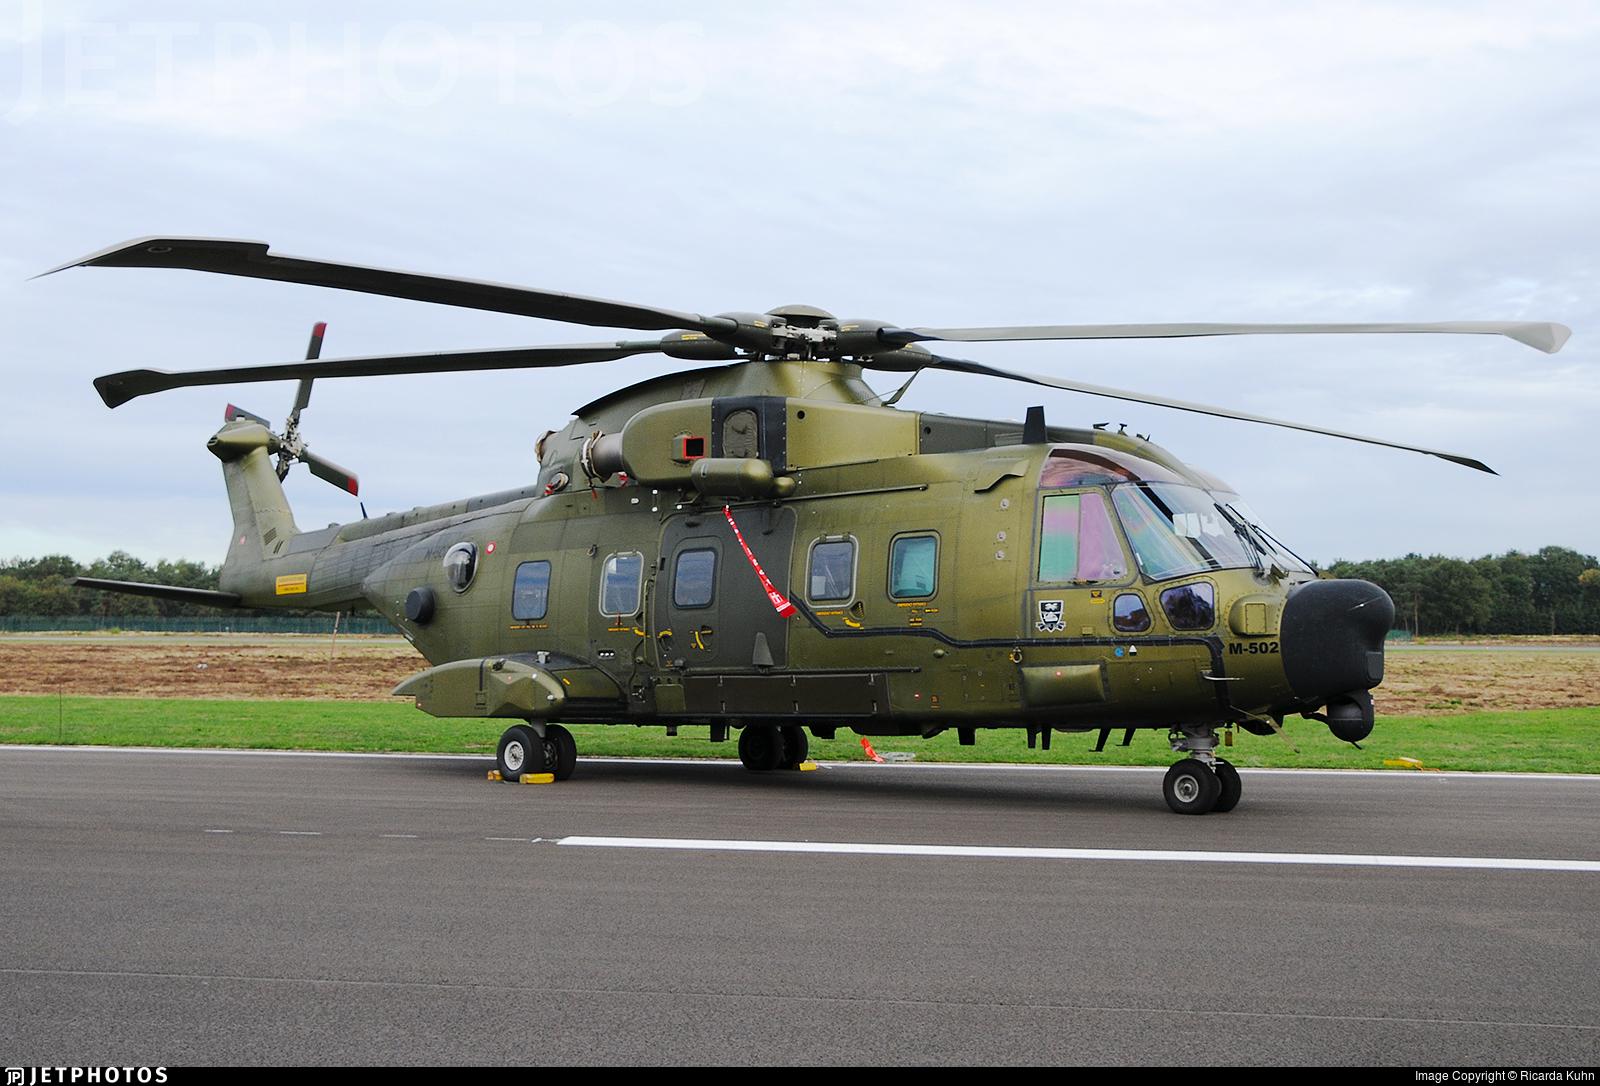 M-502 - Agusta-Westland EH-101 Merlin Mk.512 - Denmark - Air Force